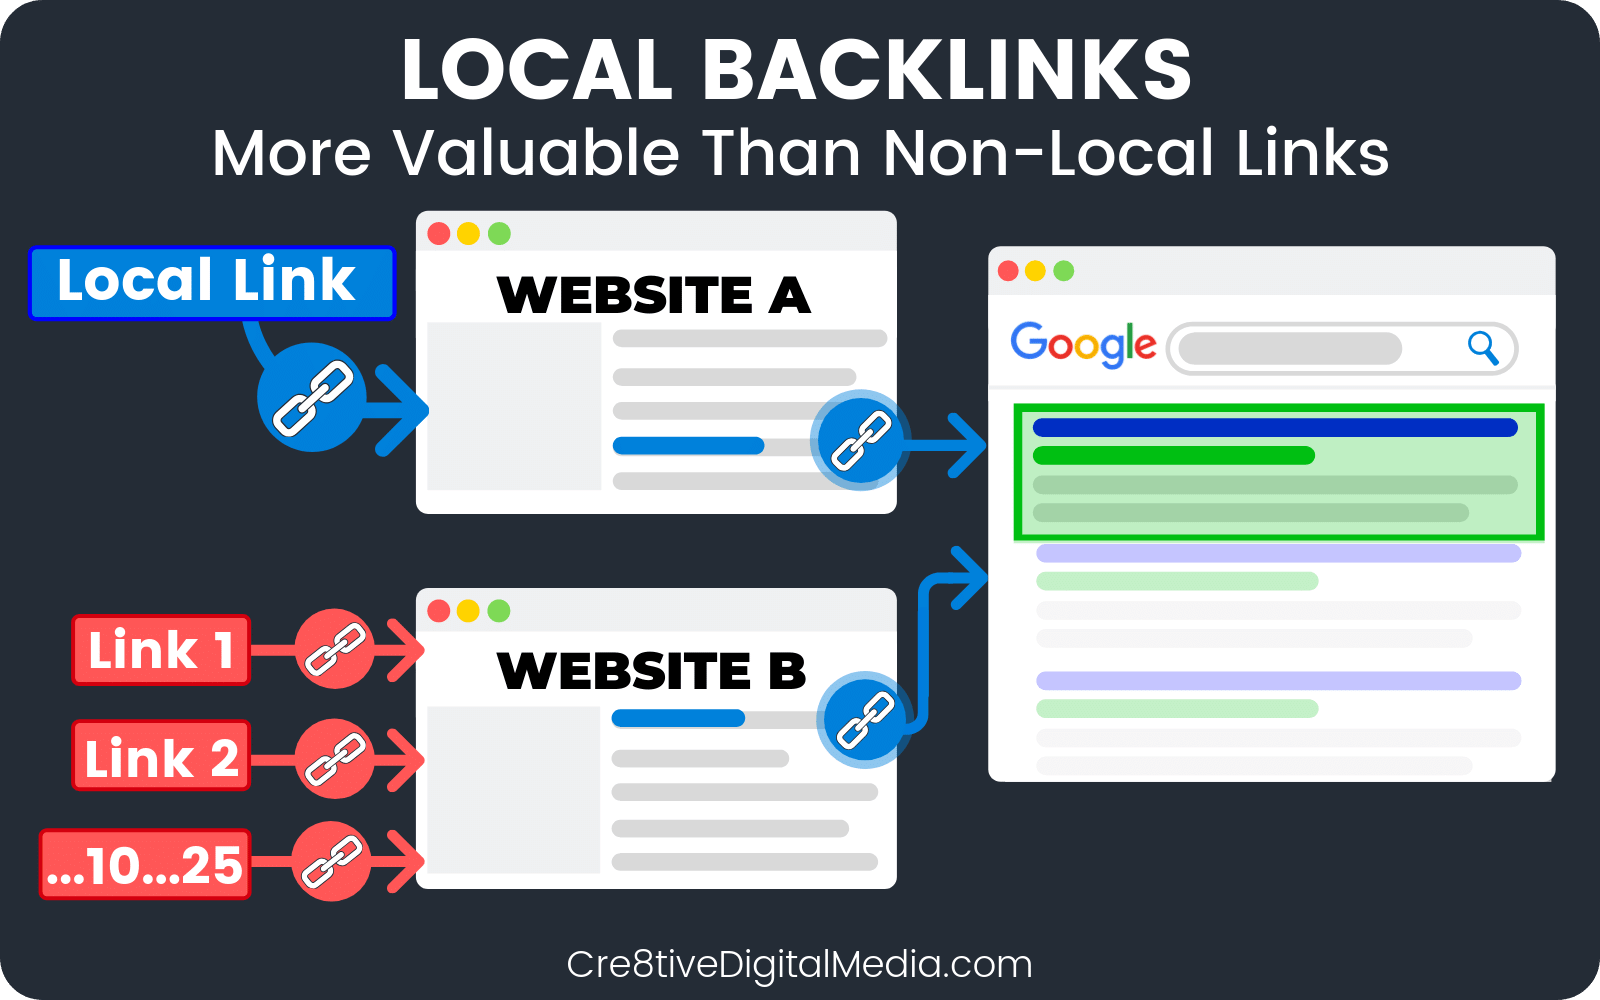 Local Backlinks vs. Regular Backlinks